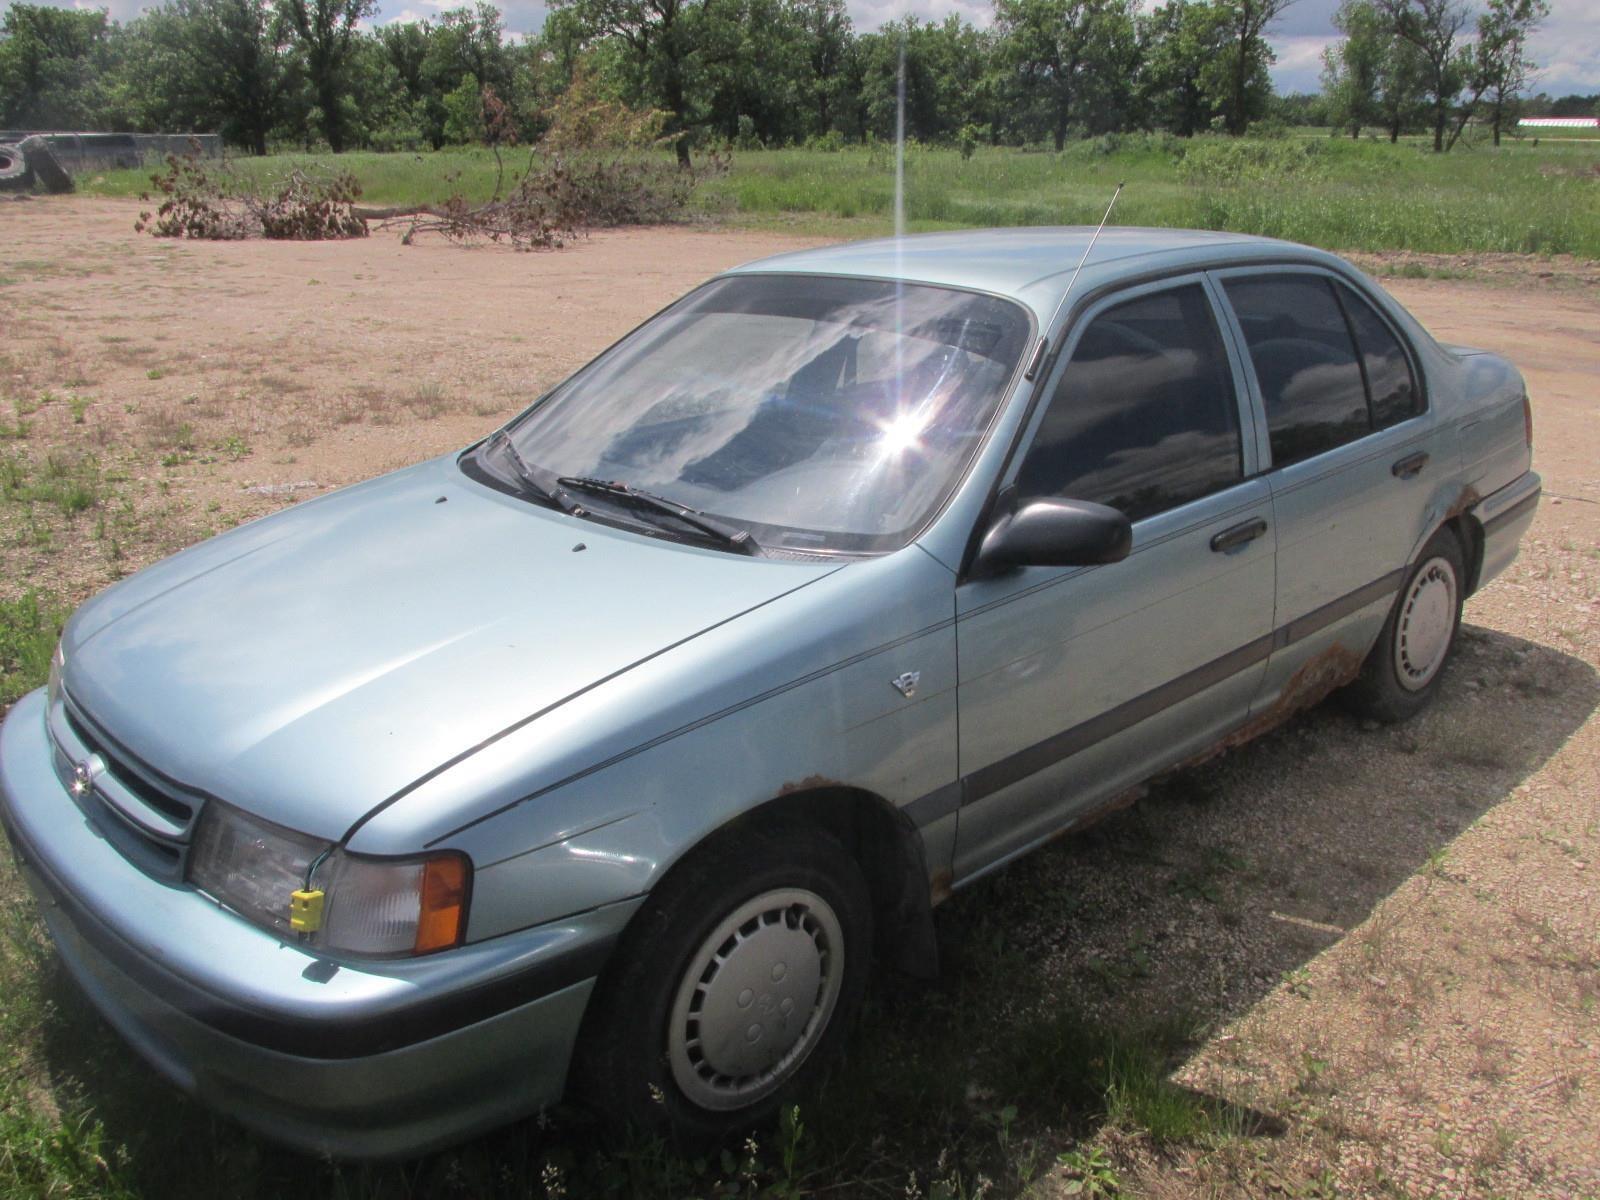 1993 toyota tercel associated auto auction ltd 1993 toyota tercel associated auto